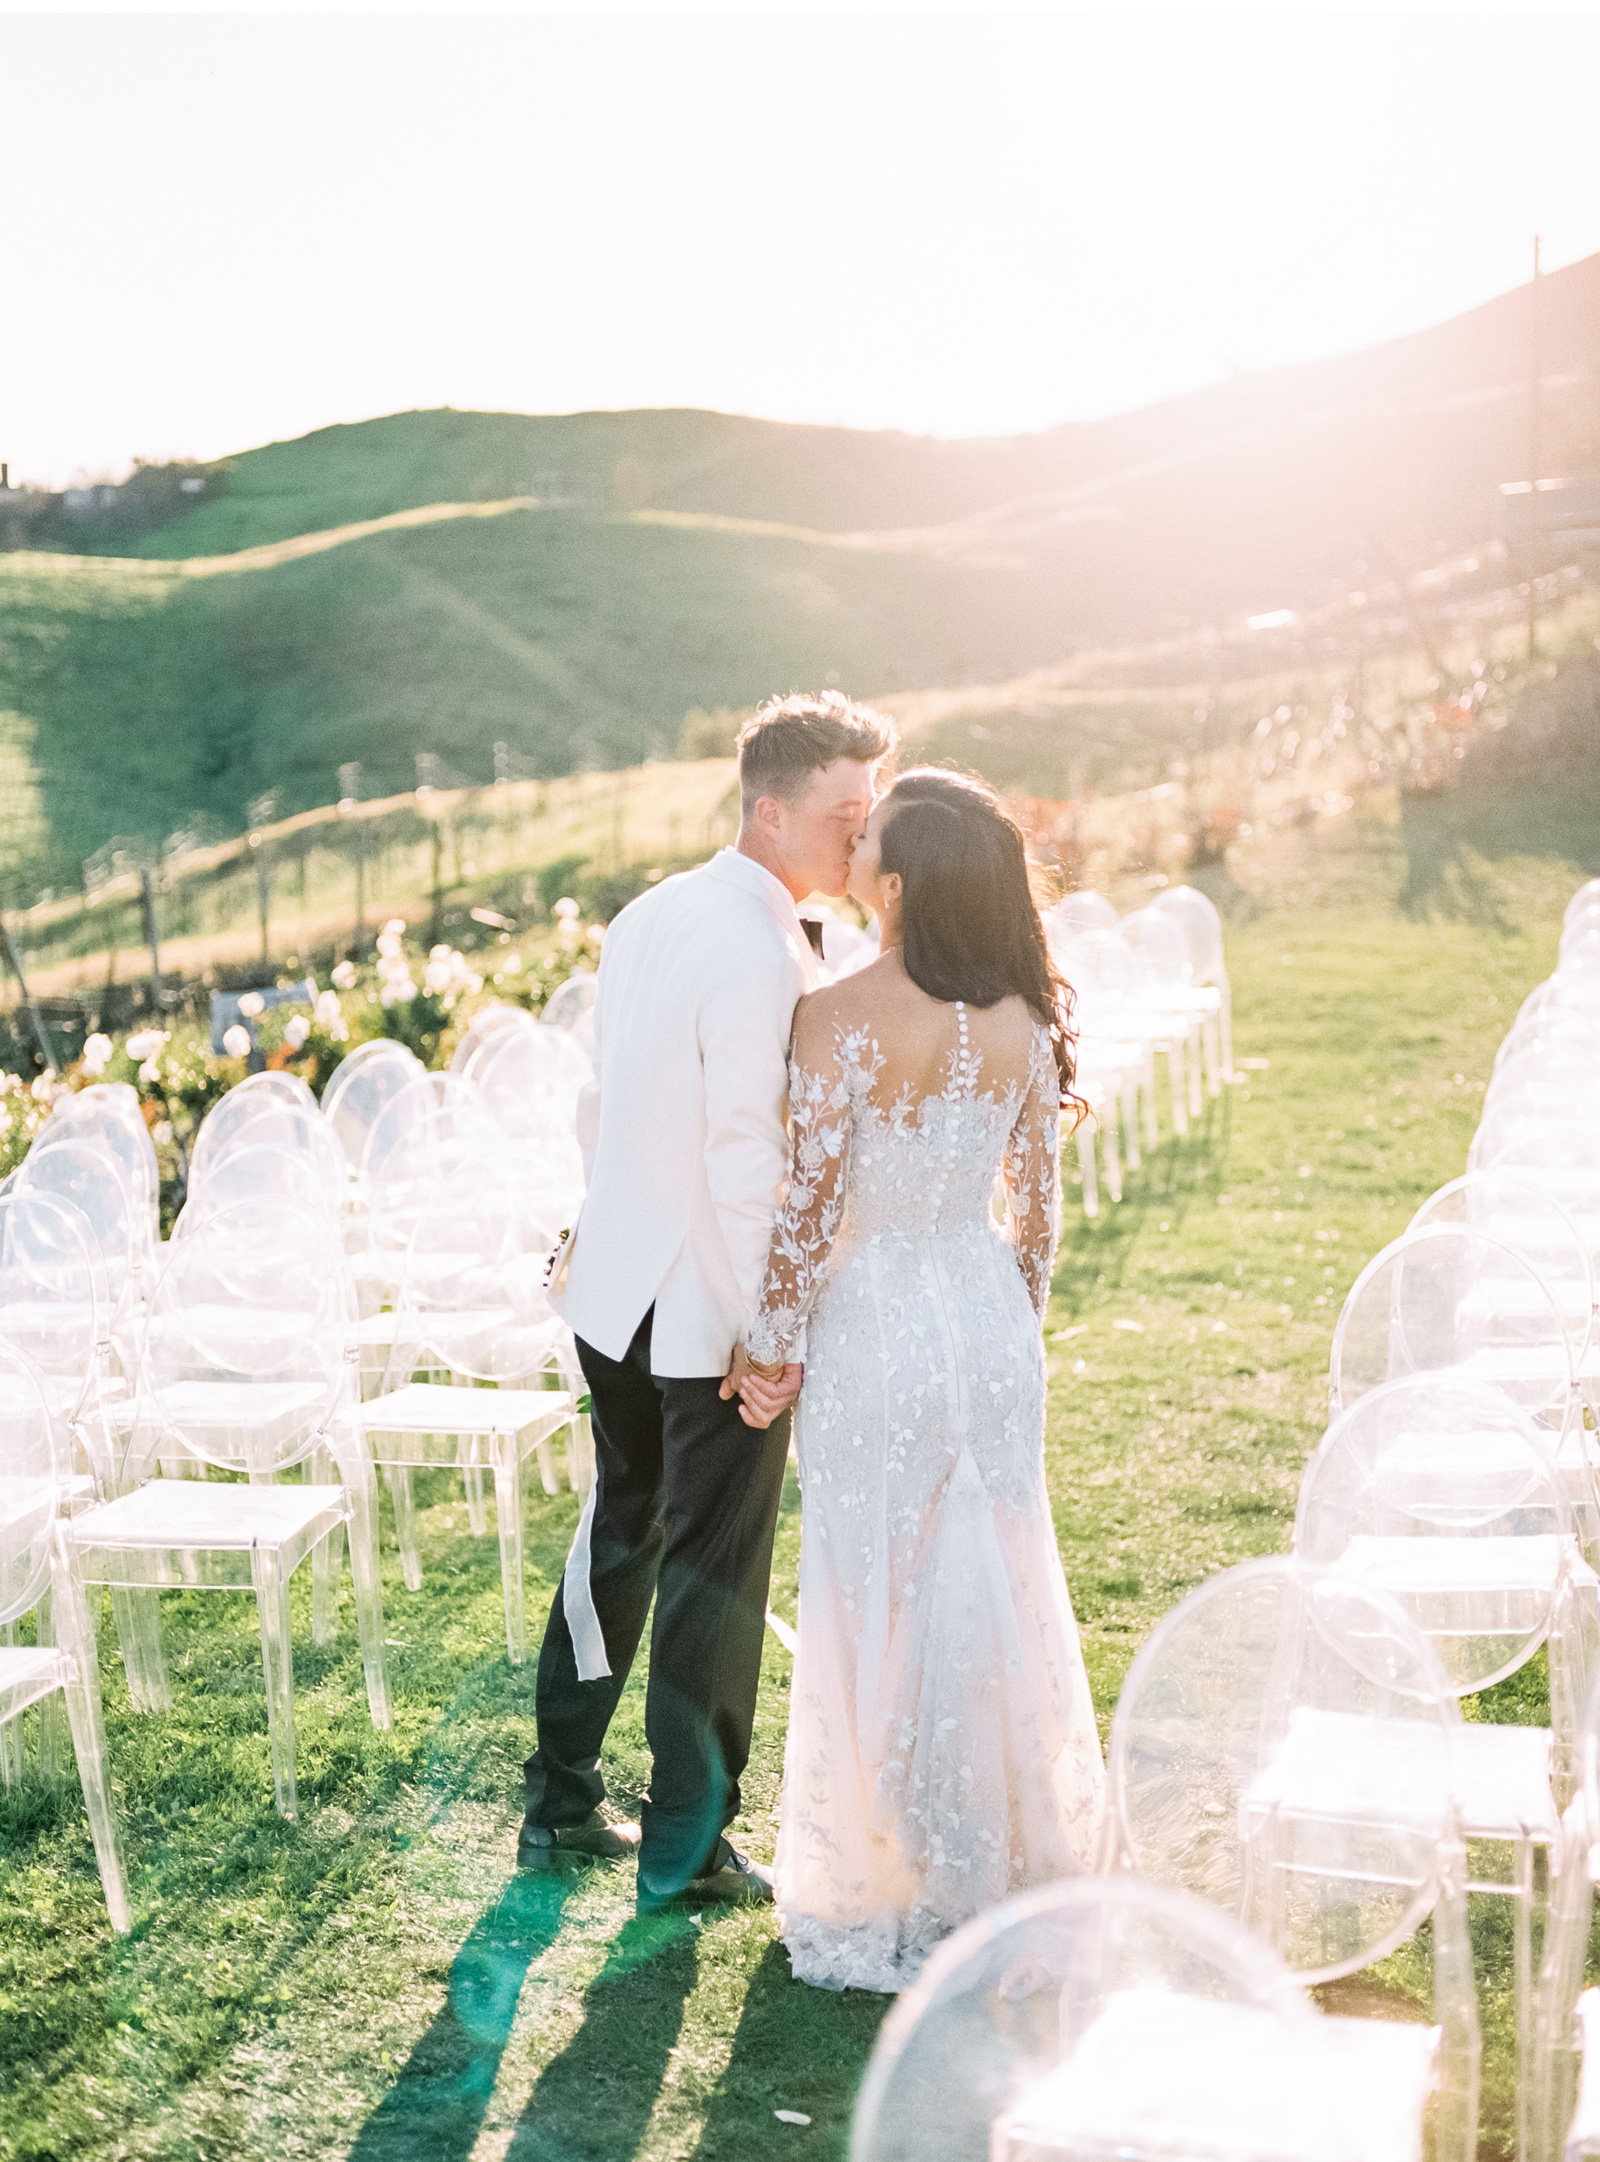 West-Coast-Weddings-Southern-California-Wedding-Photographer-Style-Me-Pretty-Fine-Art-Triunfo-Creek-Malibu-Natalie-Schutt-Photography_03.jpg